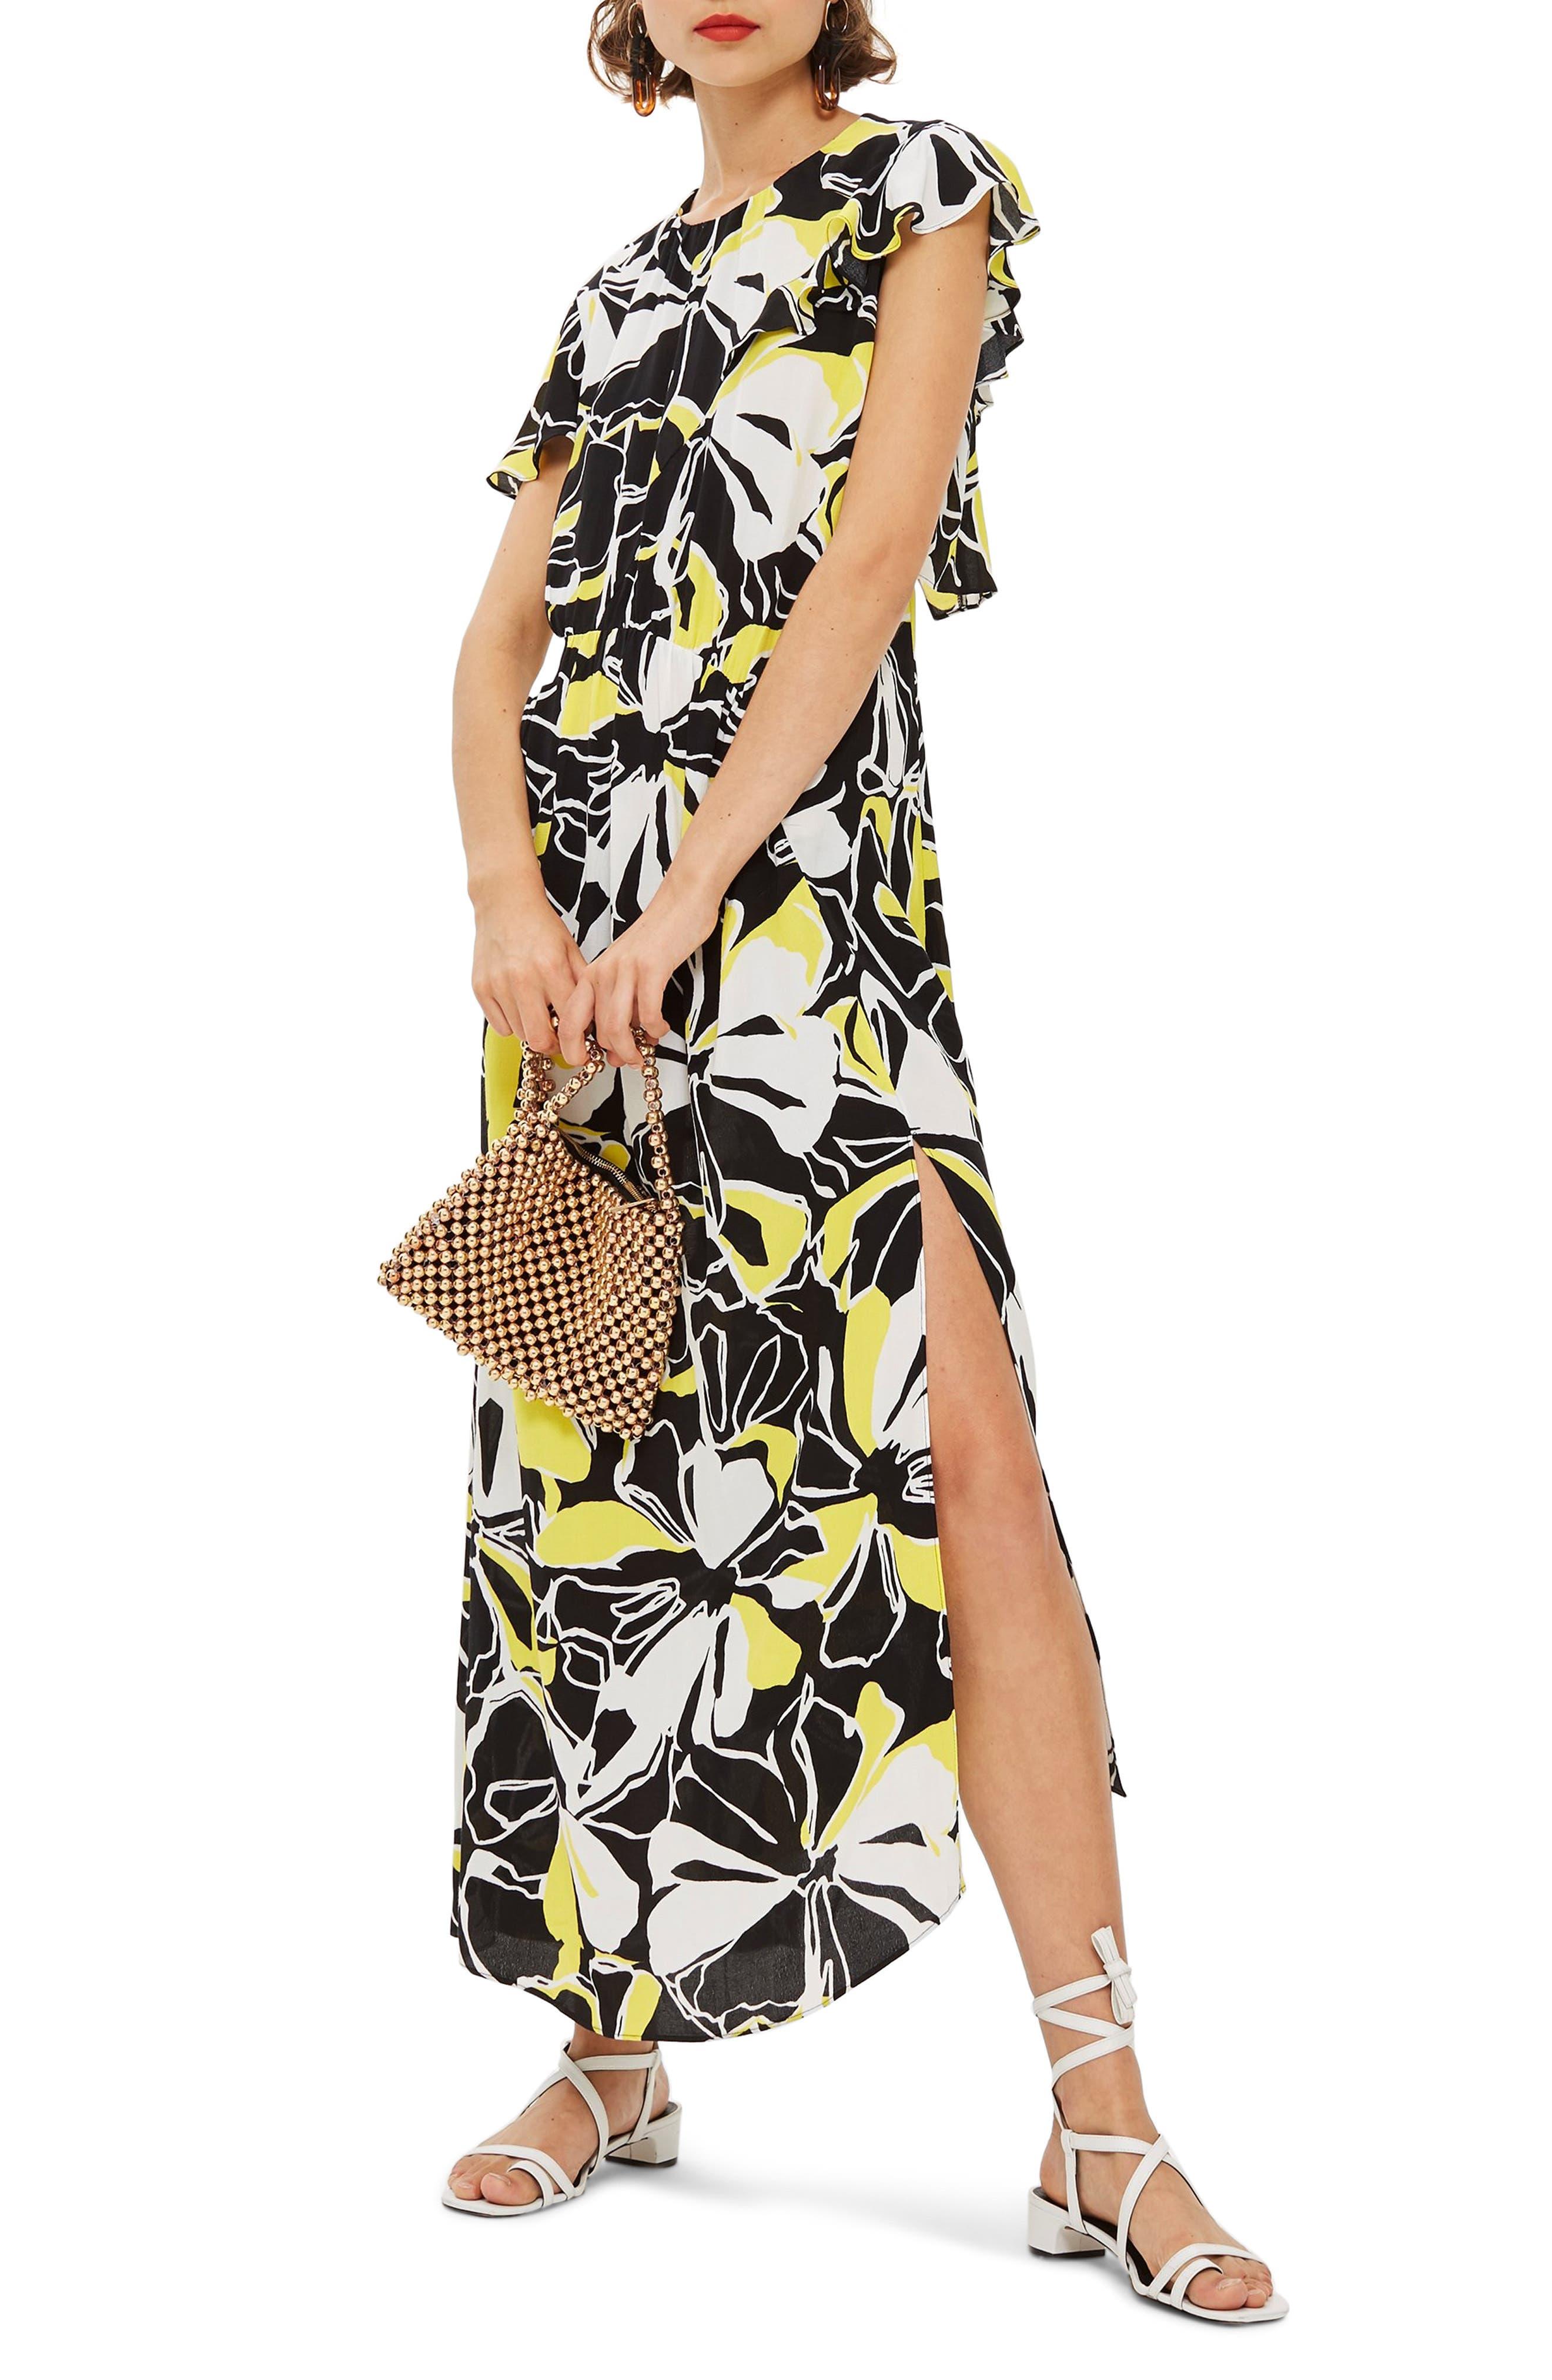 Deconstructed Floral Print Maxi Dress,                             Main thumbnail 1, color,                             BLACK MULTI